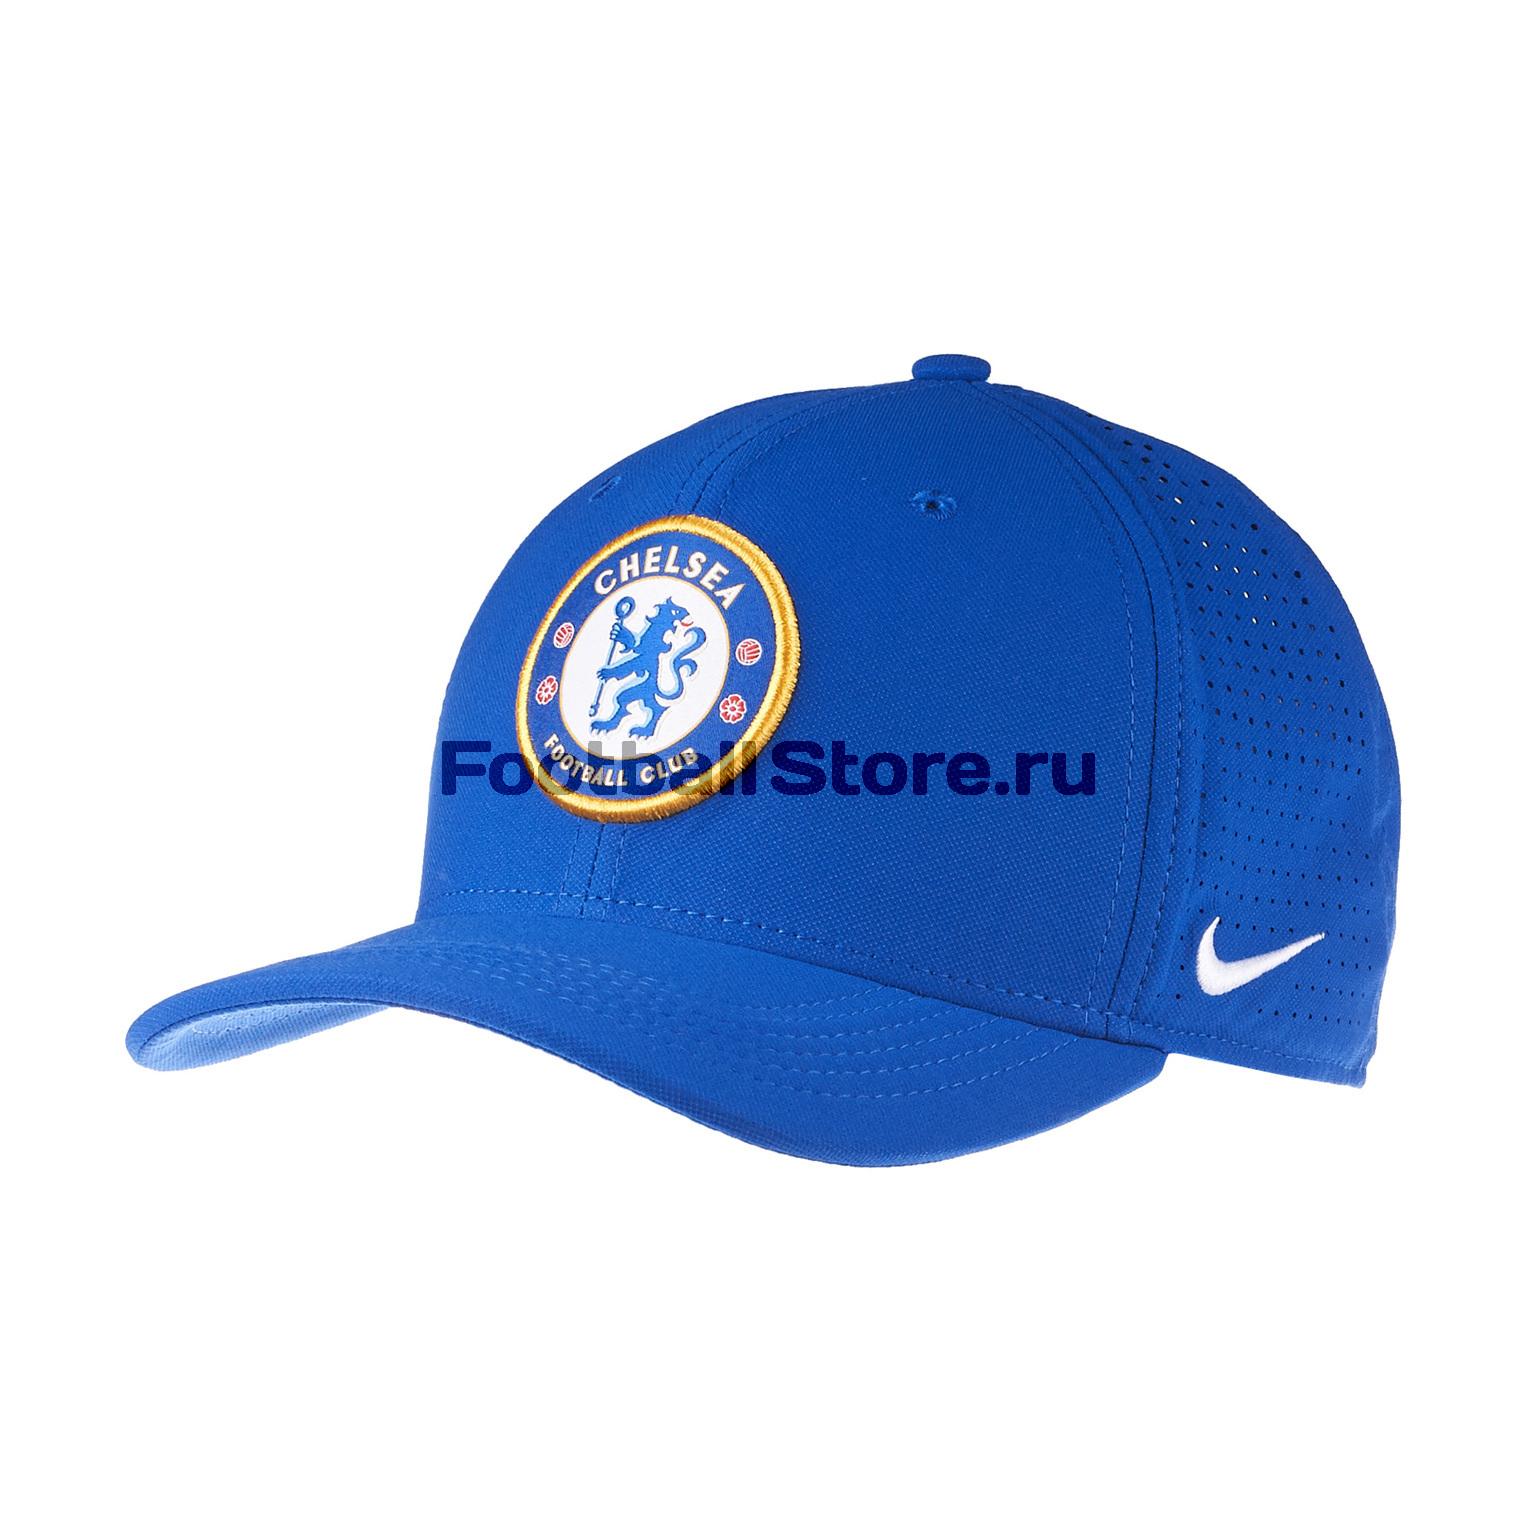 Бейсболка Nike Chelsea Arobill CLC99 Cap 928319-495 цена